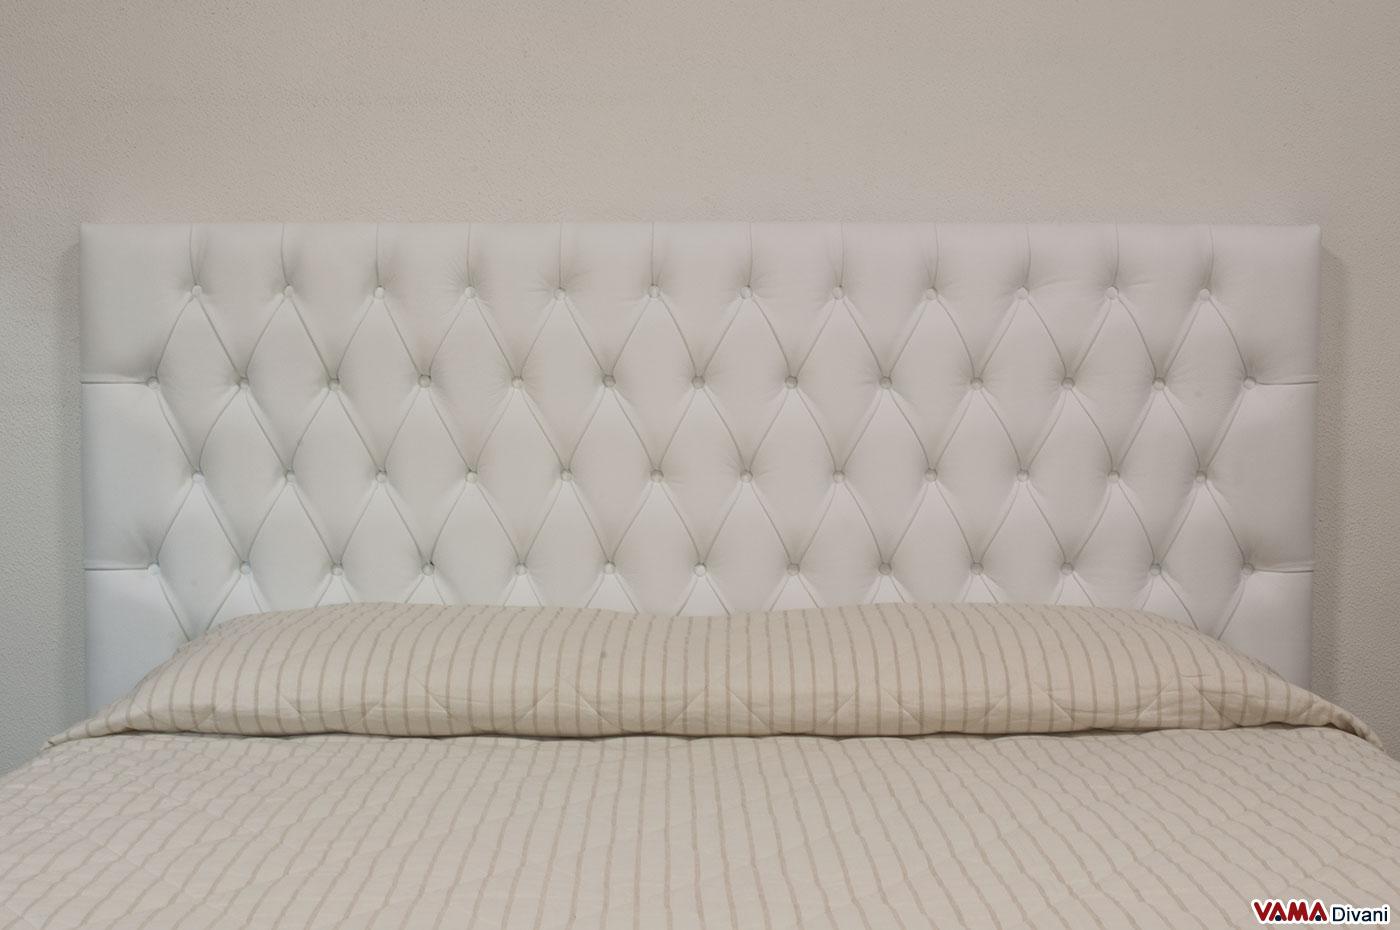 Letto in pelle aswan vama divani - Letto pelle bianca ...